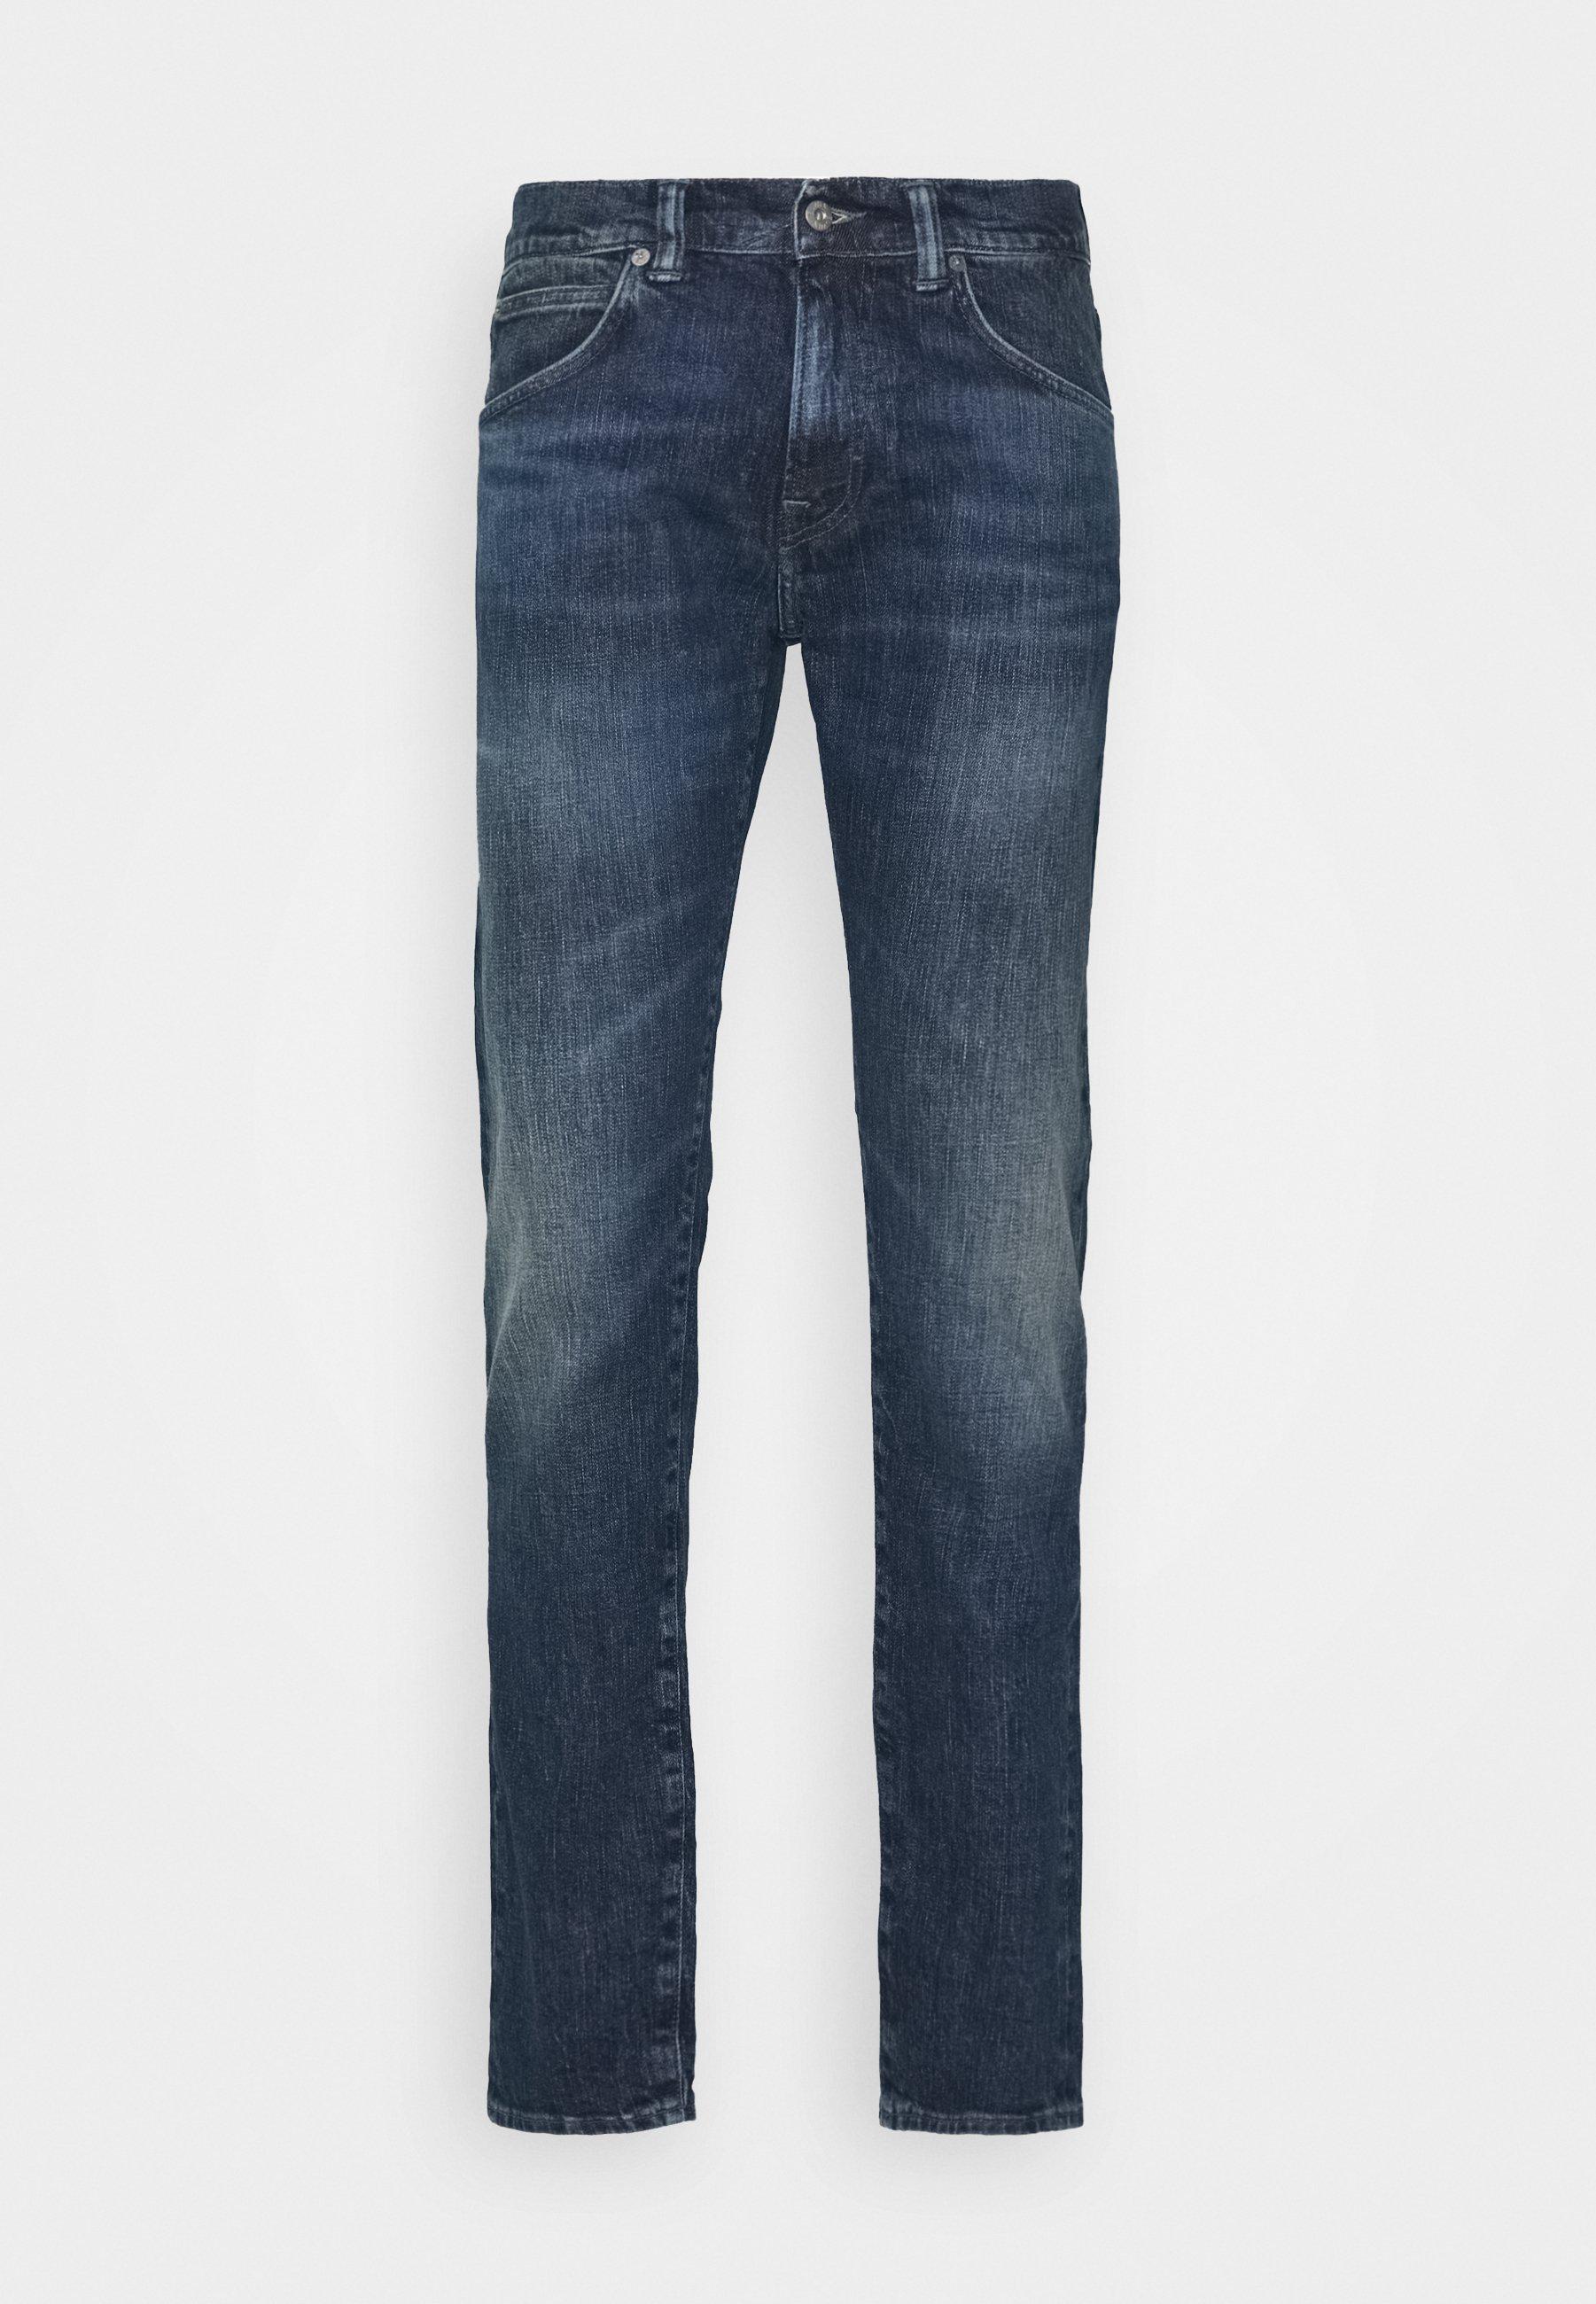 Edwin DROP CROTCH - Jeans fuselé - takeo wash yuuki blue denim